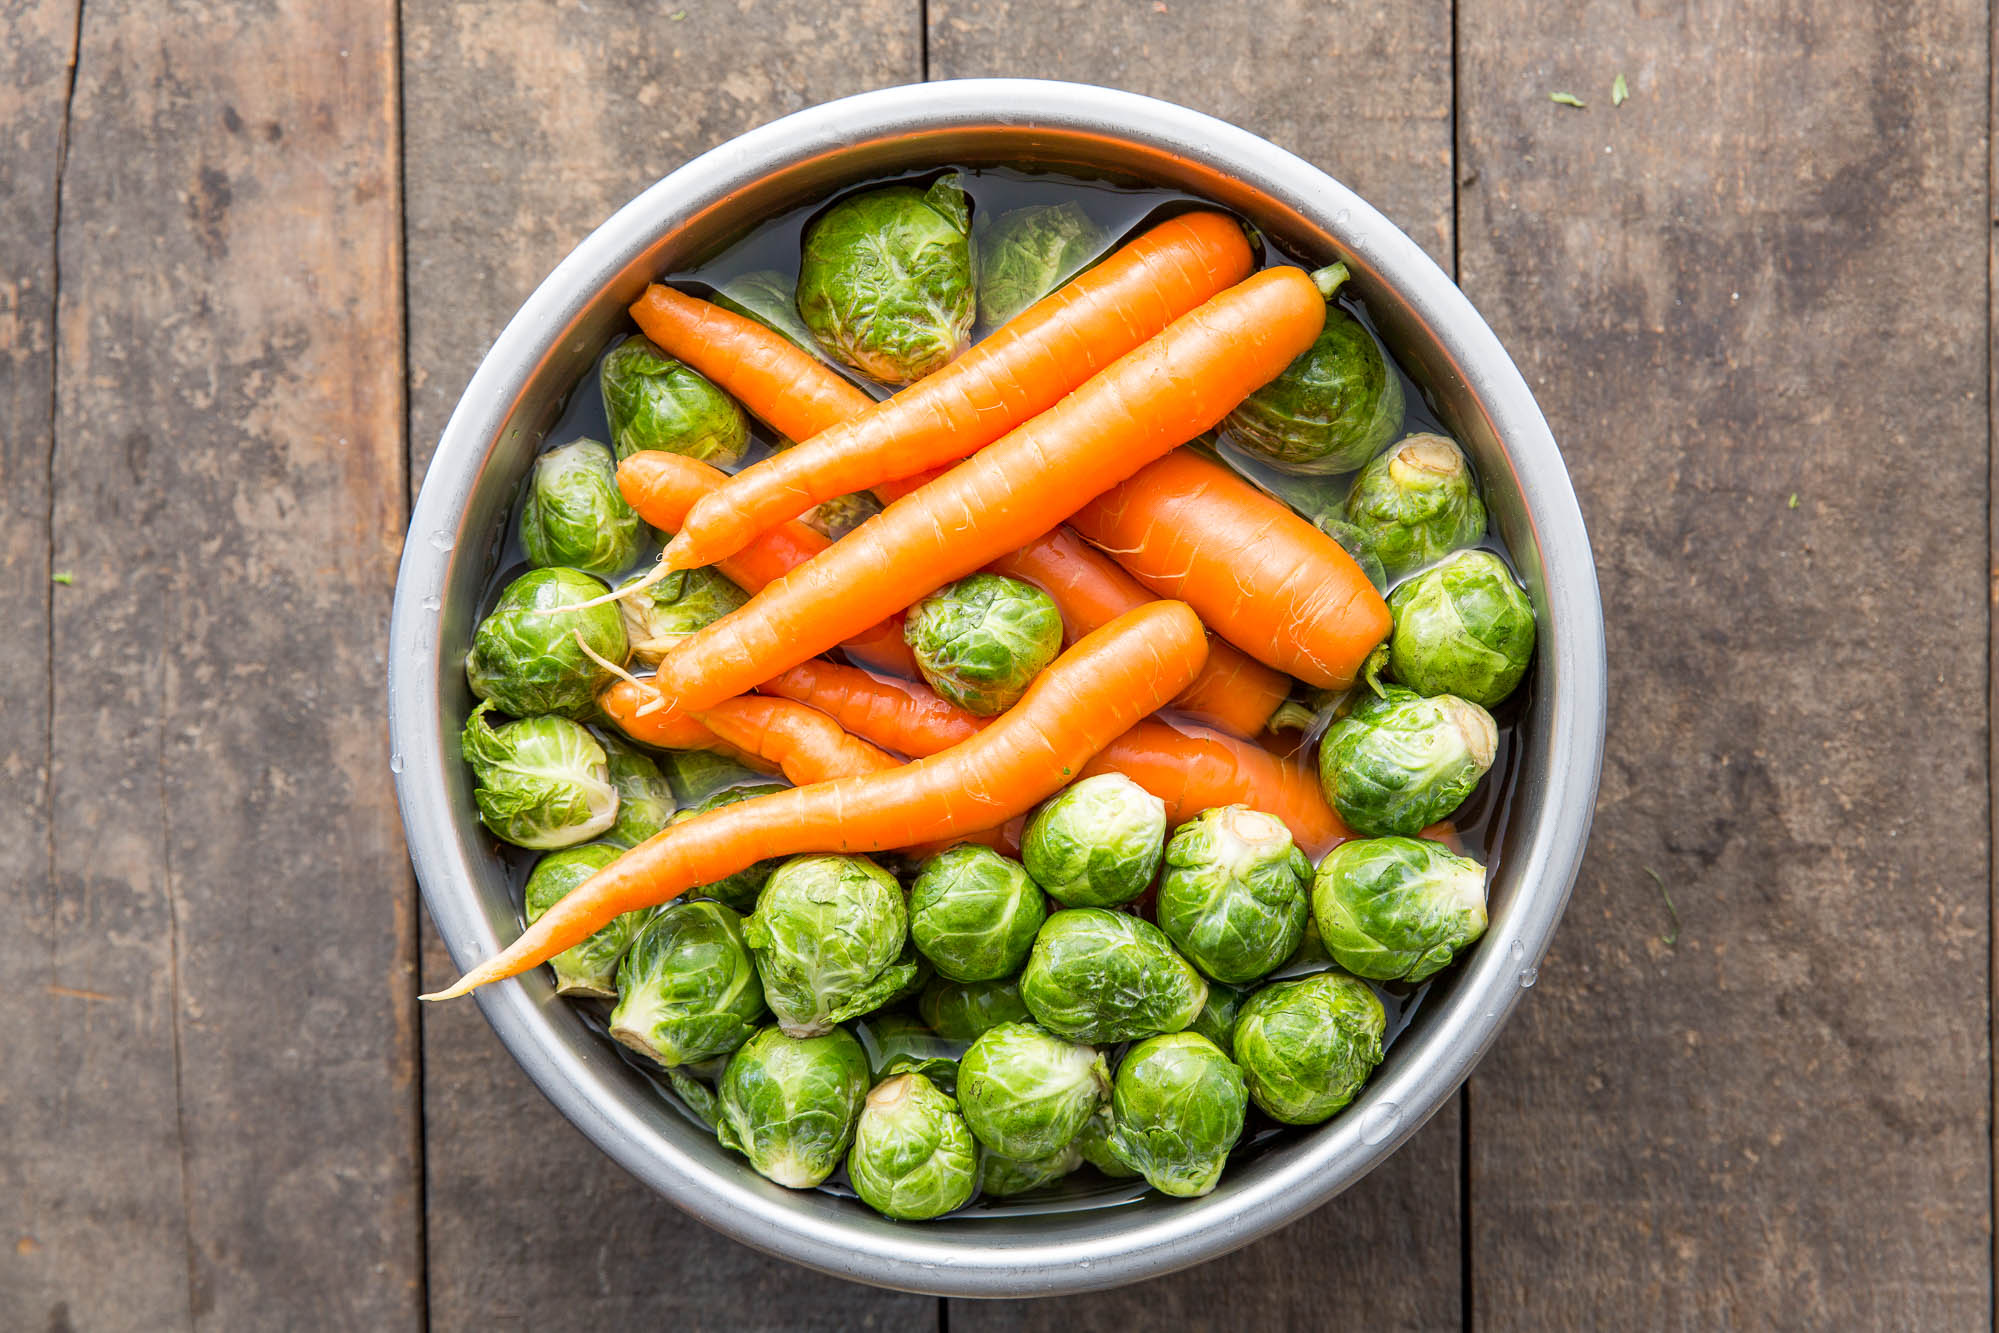 *Time-saving, water-saving tip: Rinse all the veggies in the same bowl of water.